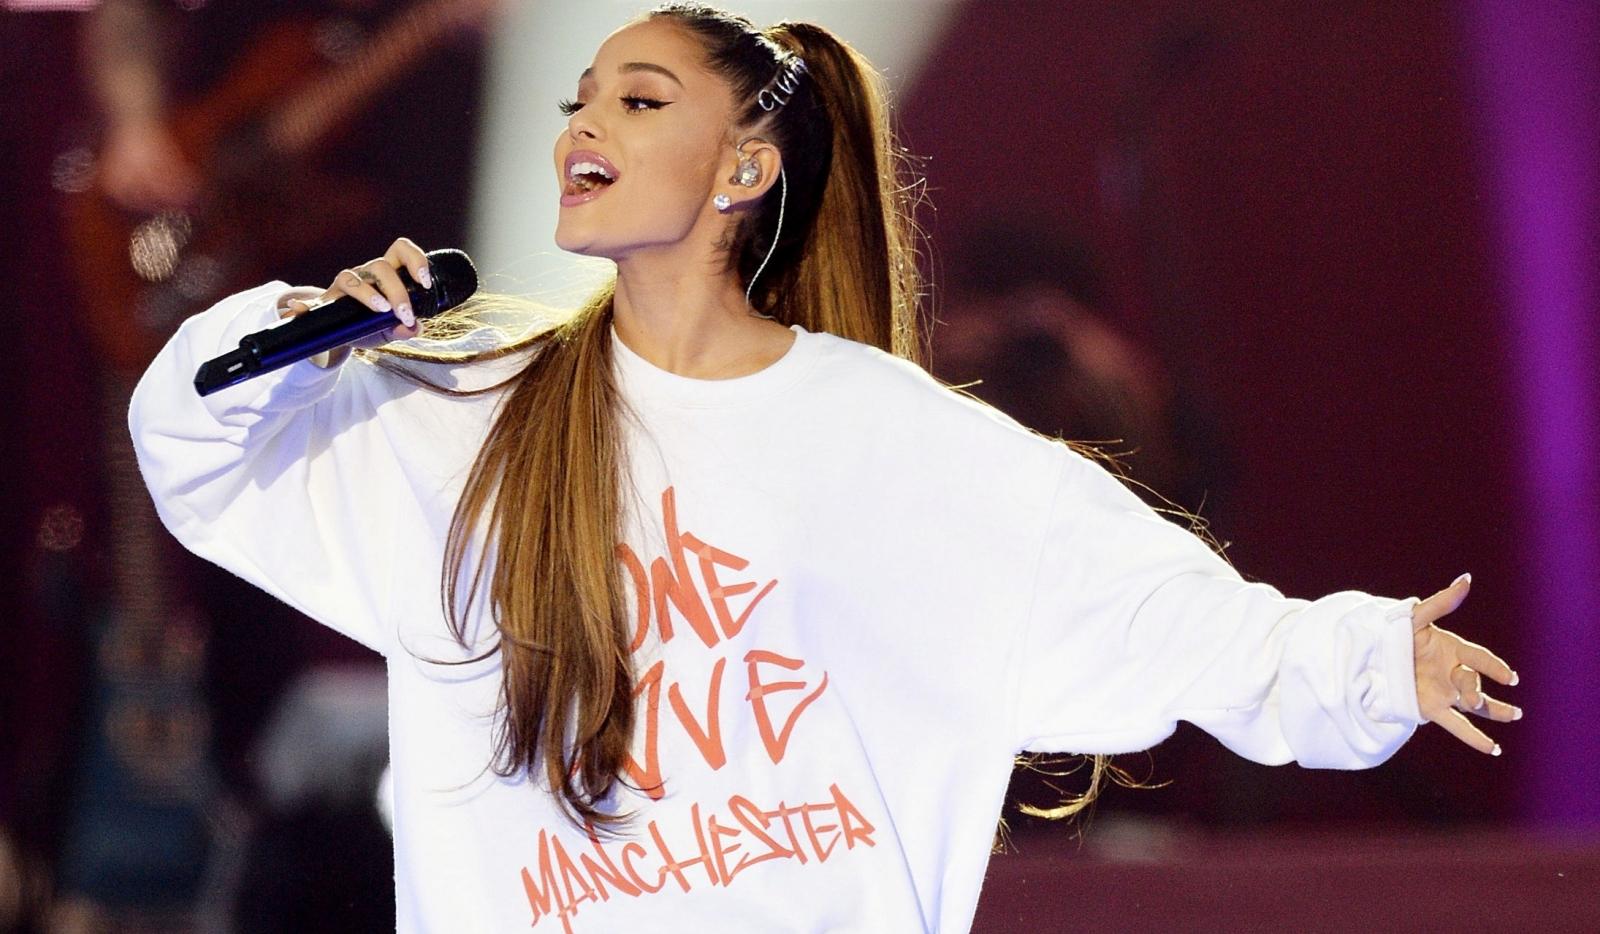 Ariana Grande's charity single chart postiion